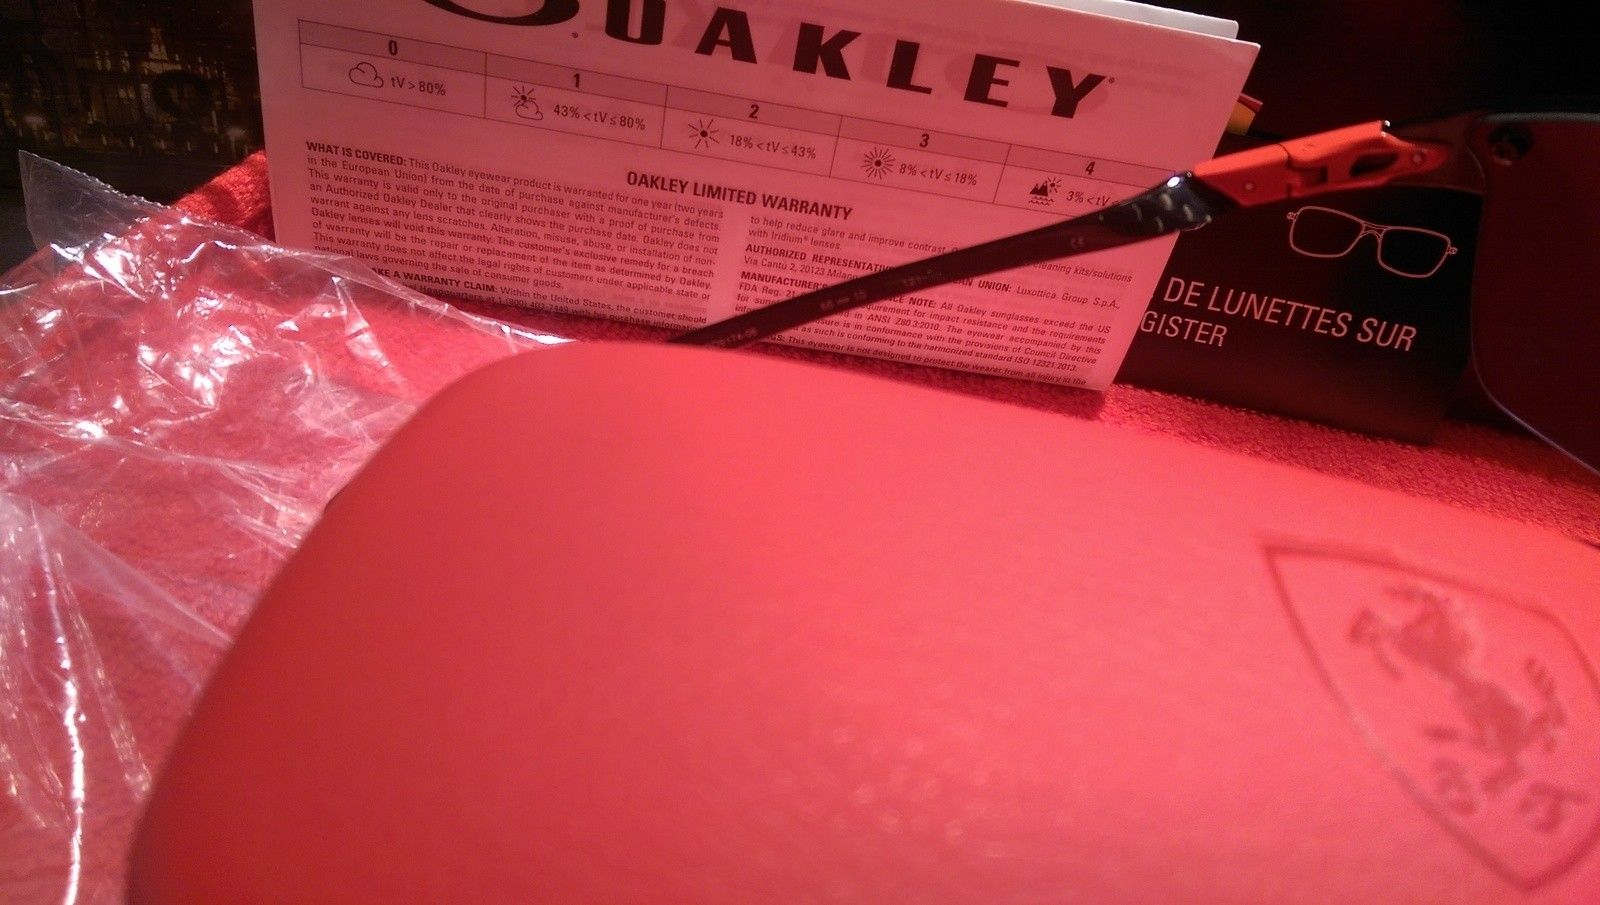 Oakley Scuderia Ferrari Carbon Blade ***Price Drop*** - uploadfromtaptalk1452608315678.jpg